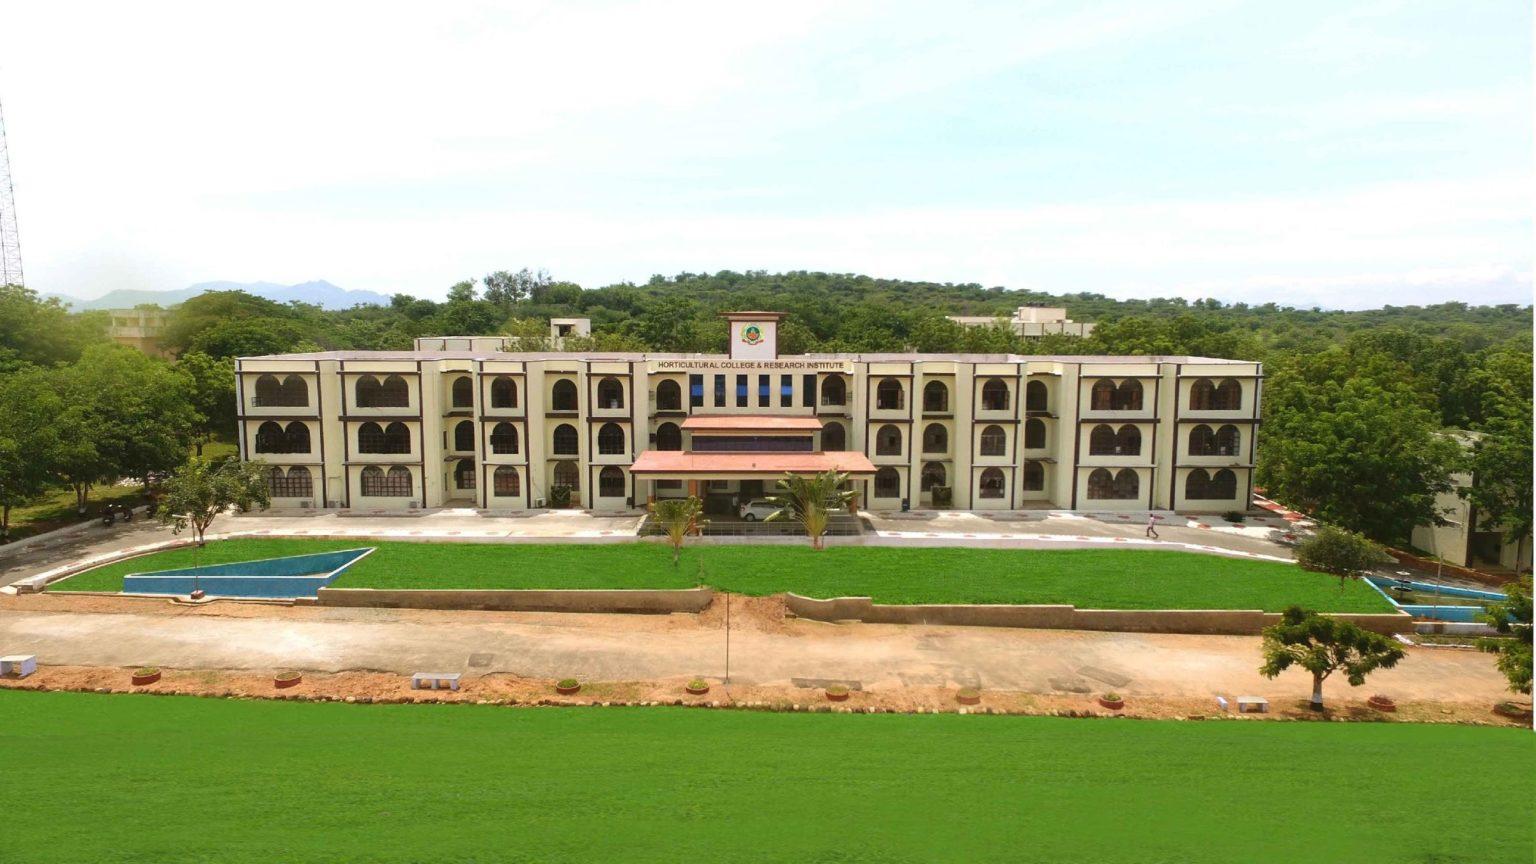 Horticultural College and Research Institute Periyakulam, Theni